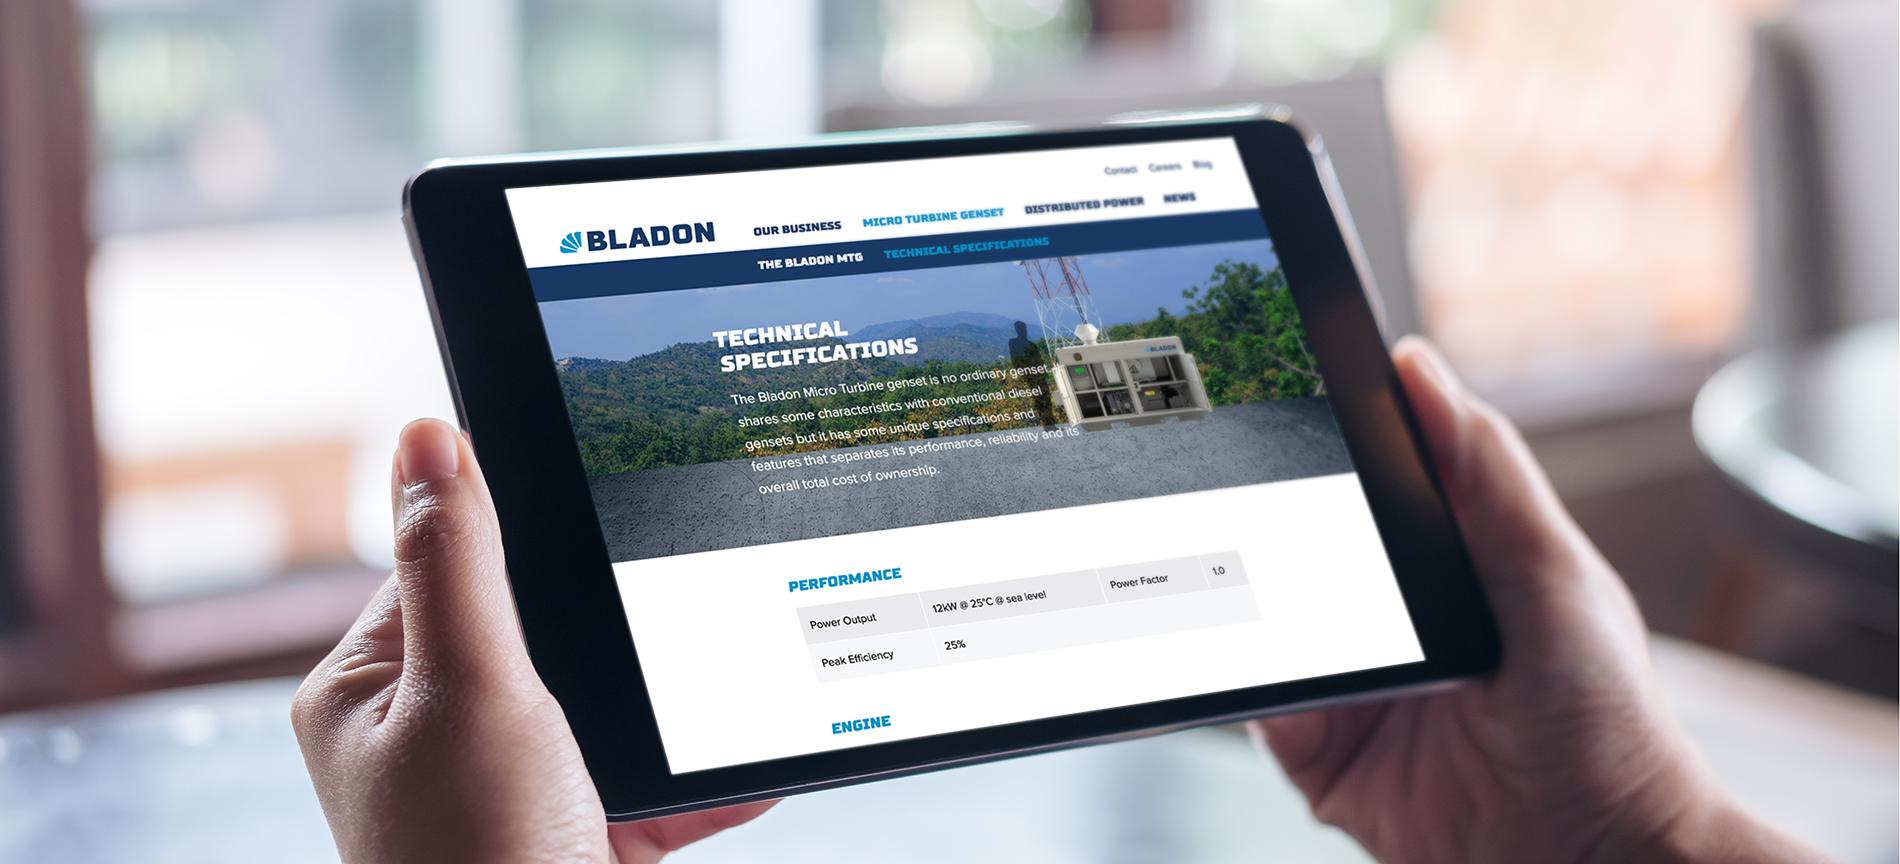 The Bladon website on an iPad - desktop